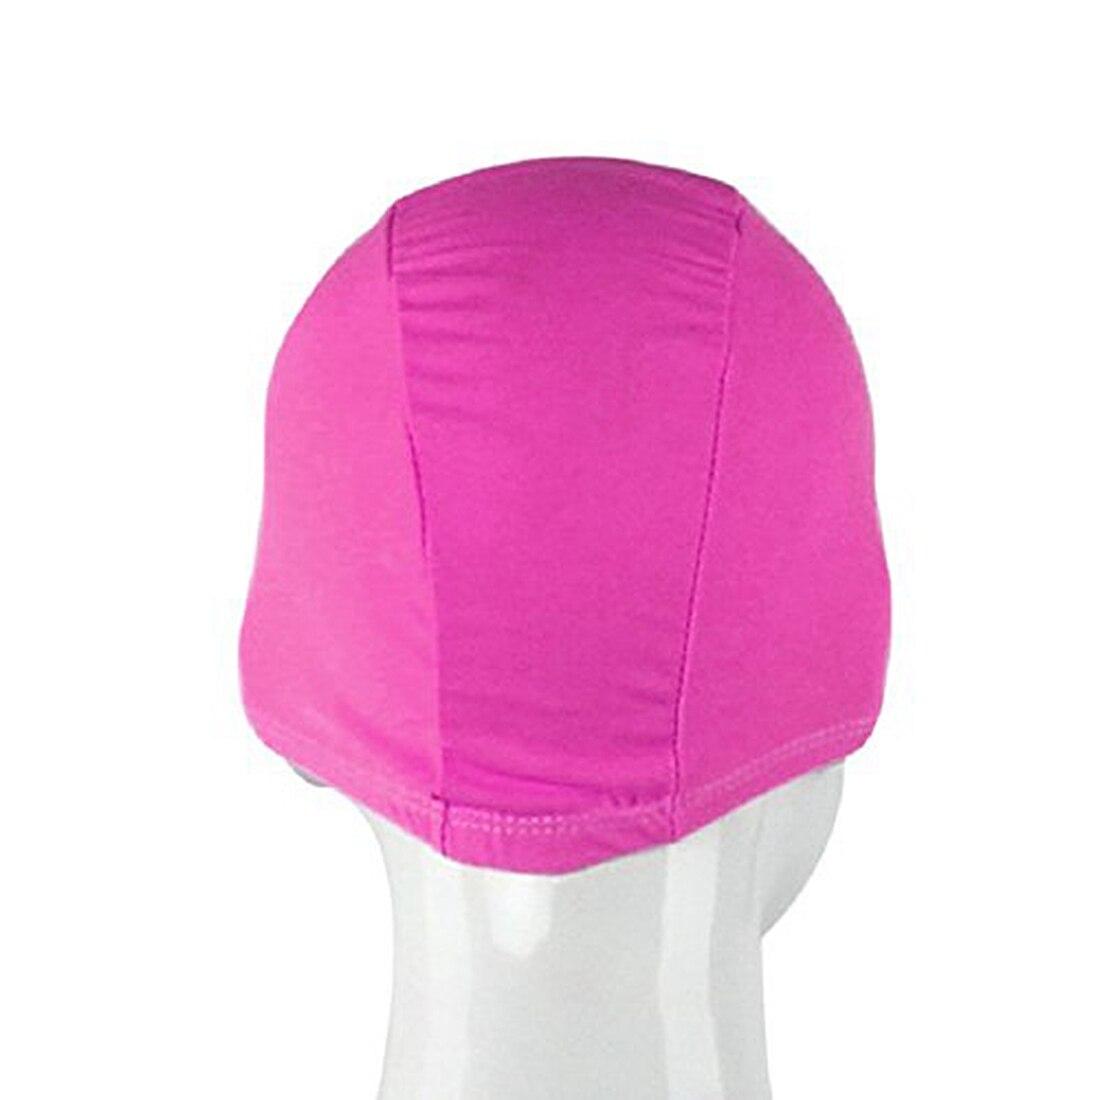 Adult Swimming Hats Unisex Outdoor Sports Stretch Cap Karachi